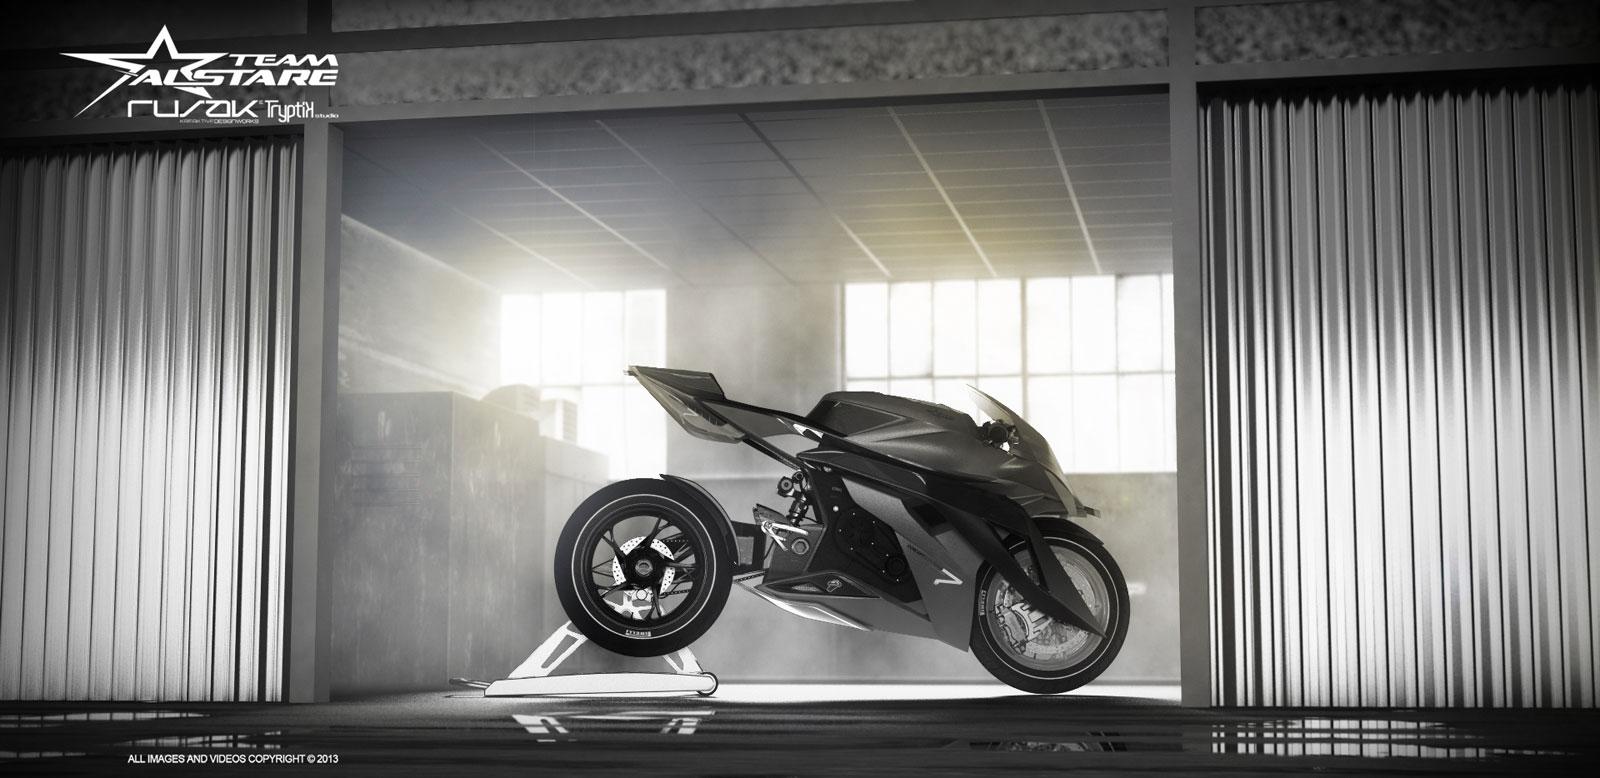 http://www.diseno-art.com/news_content/wp-content/uploads/2013/06/Alstare-Concept-Superbike-11.jpg